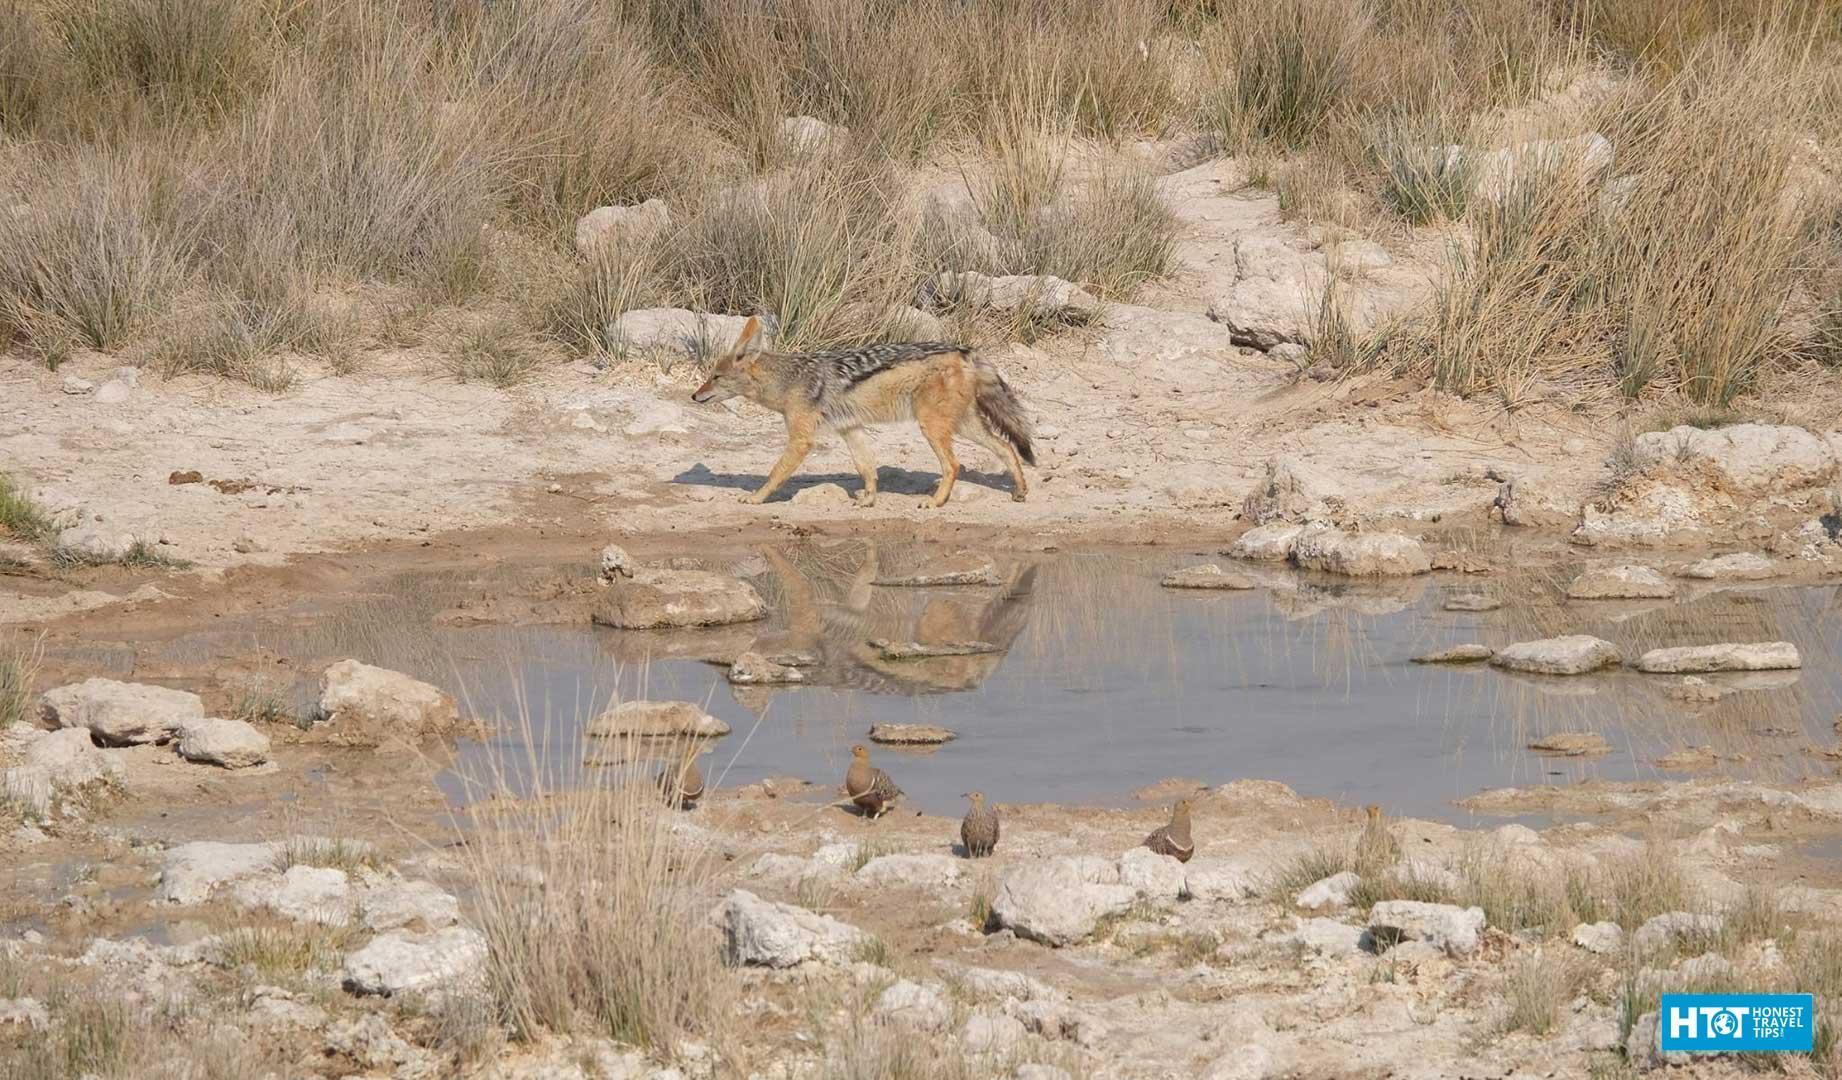 Namibia Travel Tips + Photos - HonestTravelTips com